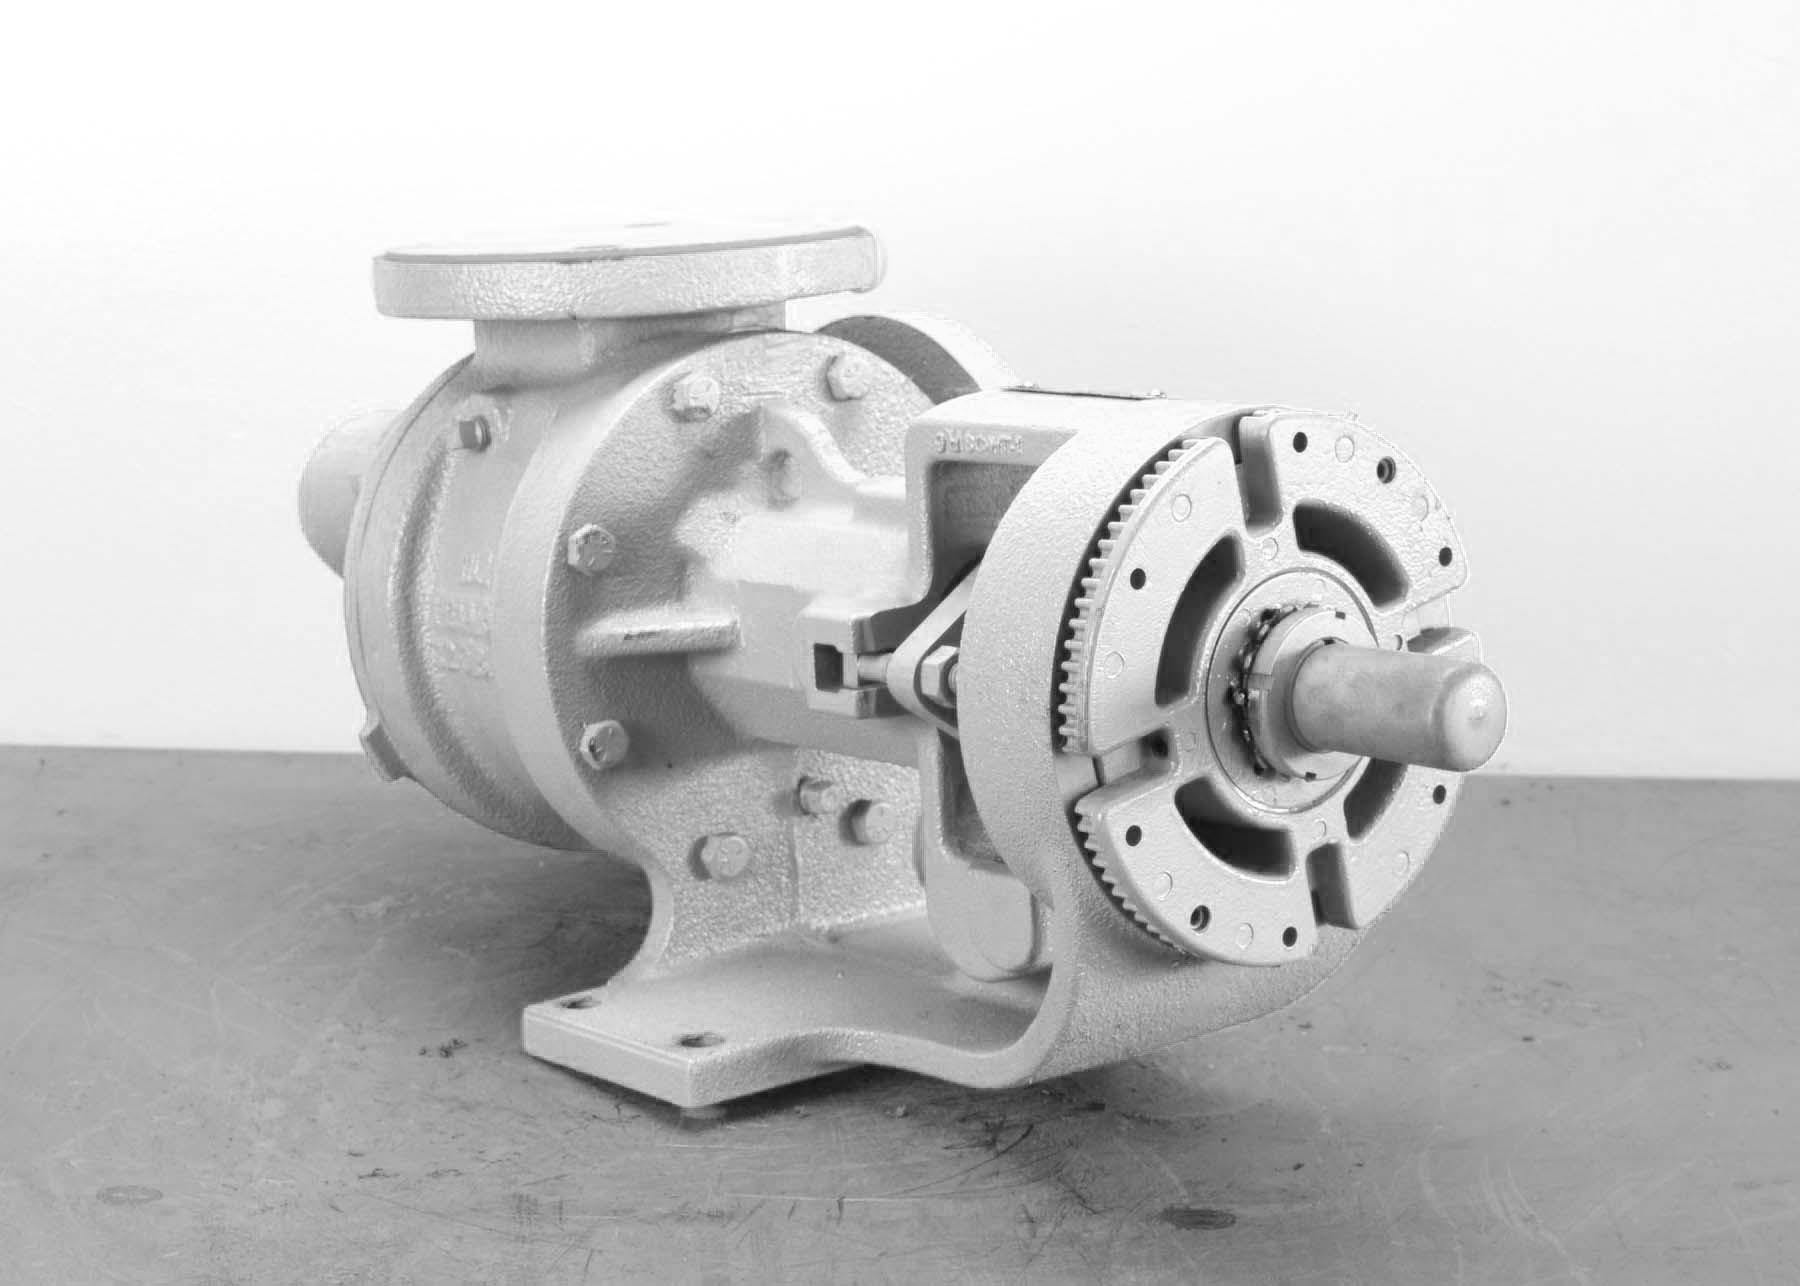 Aftermarket Drop-In Replaces Viking® KK124A Pump